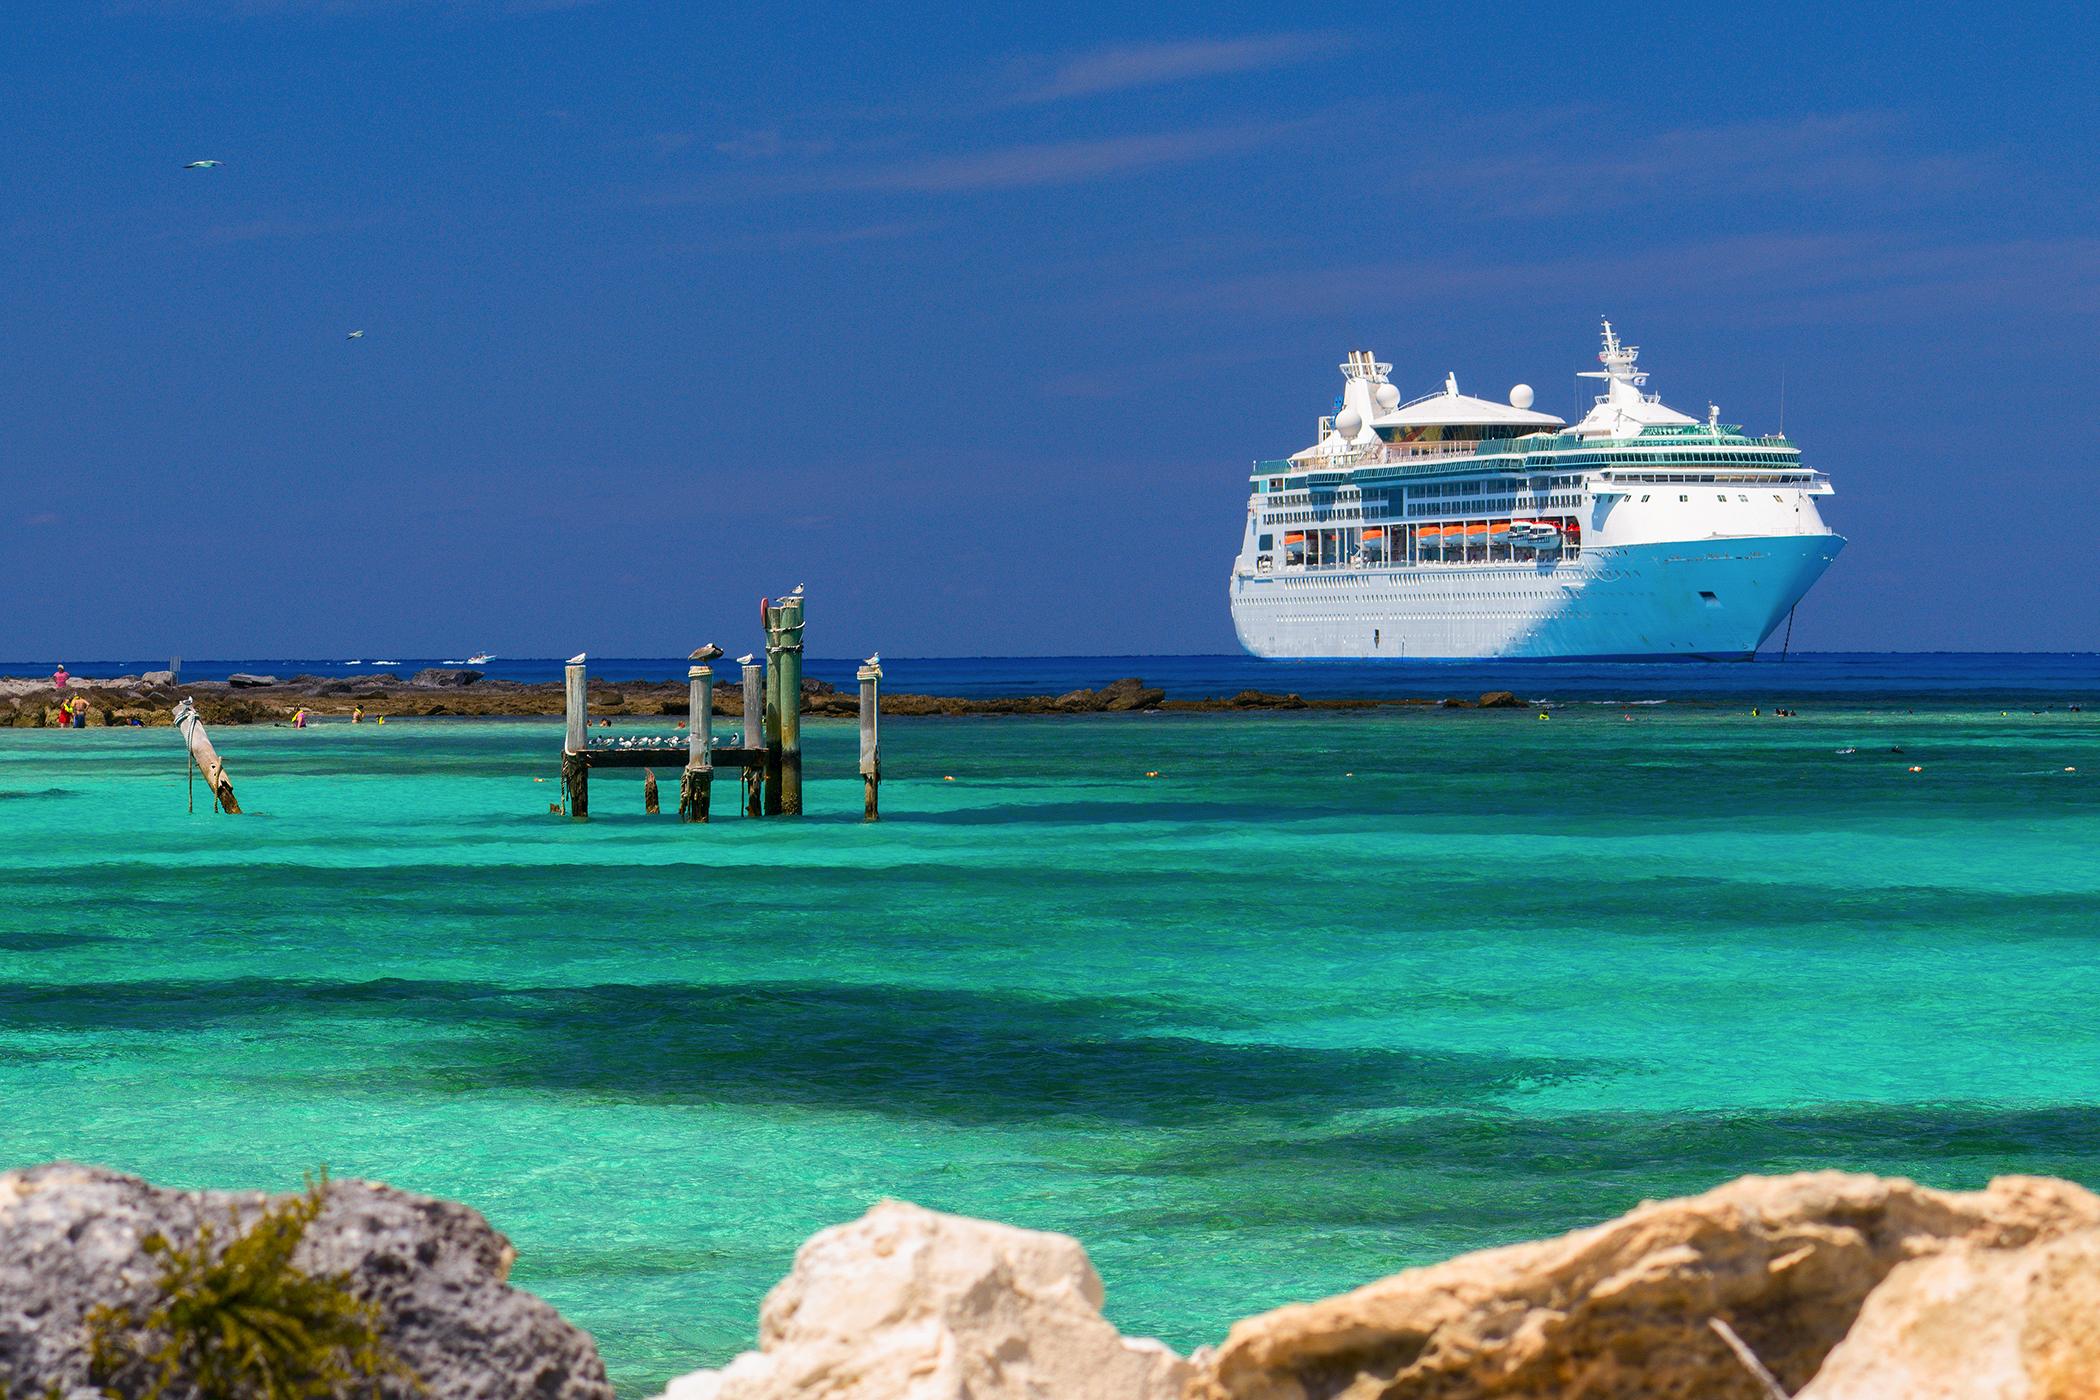 cruise ship anchored in the caribbean.